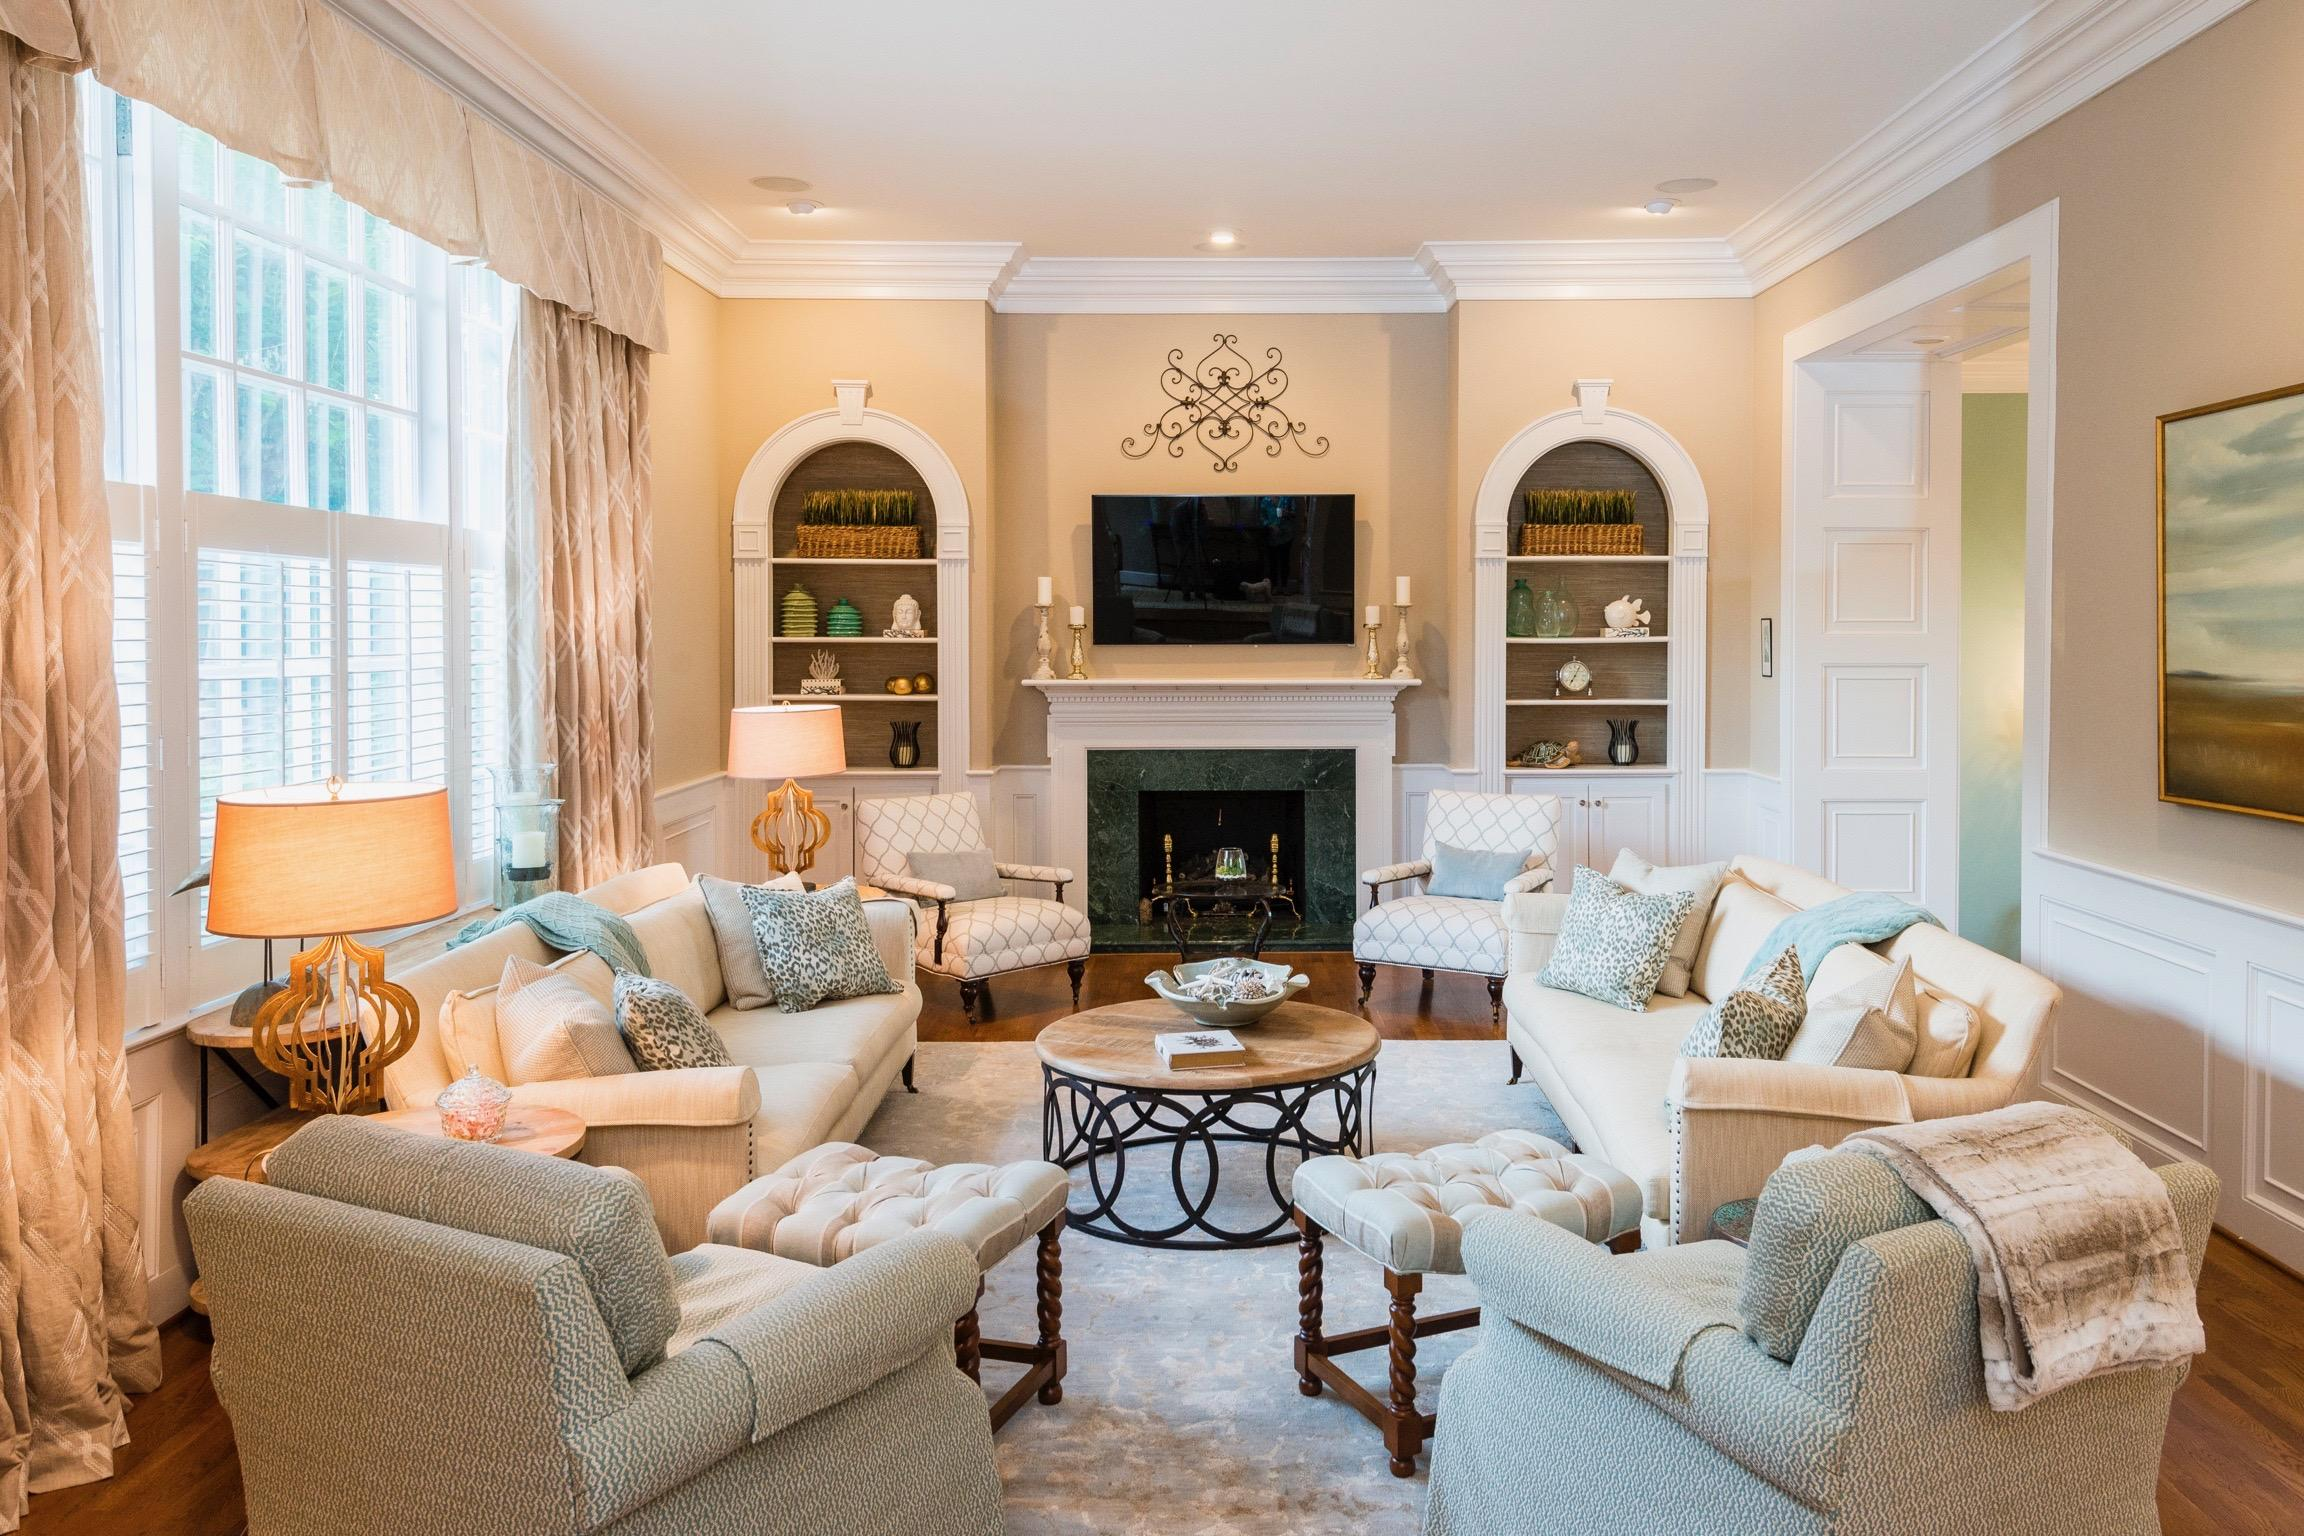 Lawton Bluff Homes For Sale - 685 Shore, Charleston, SC - 1